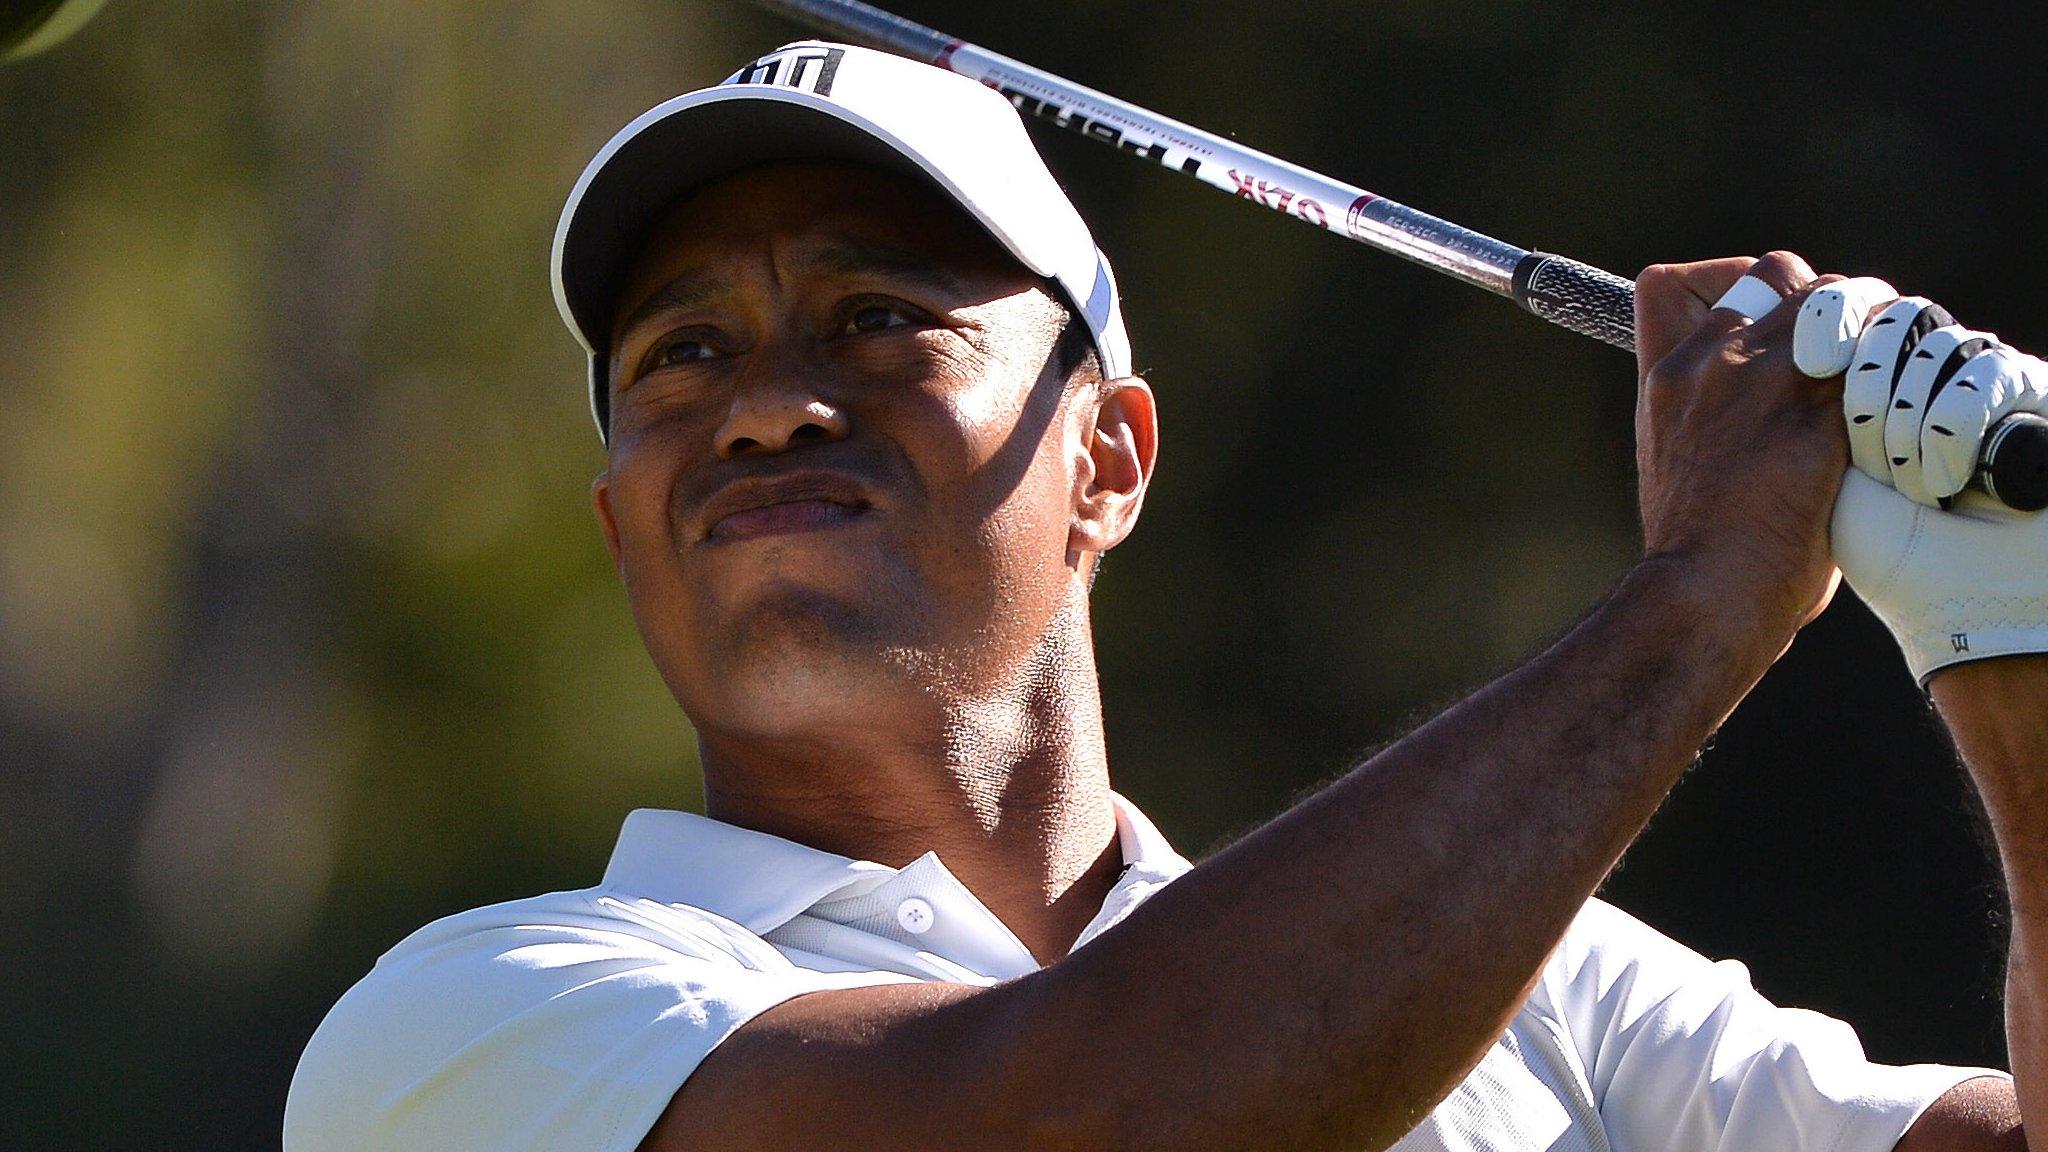 Genesis Open: Tiger Woods misses cut as Graeme McDowell in joint lead